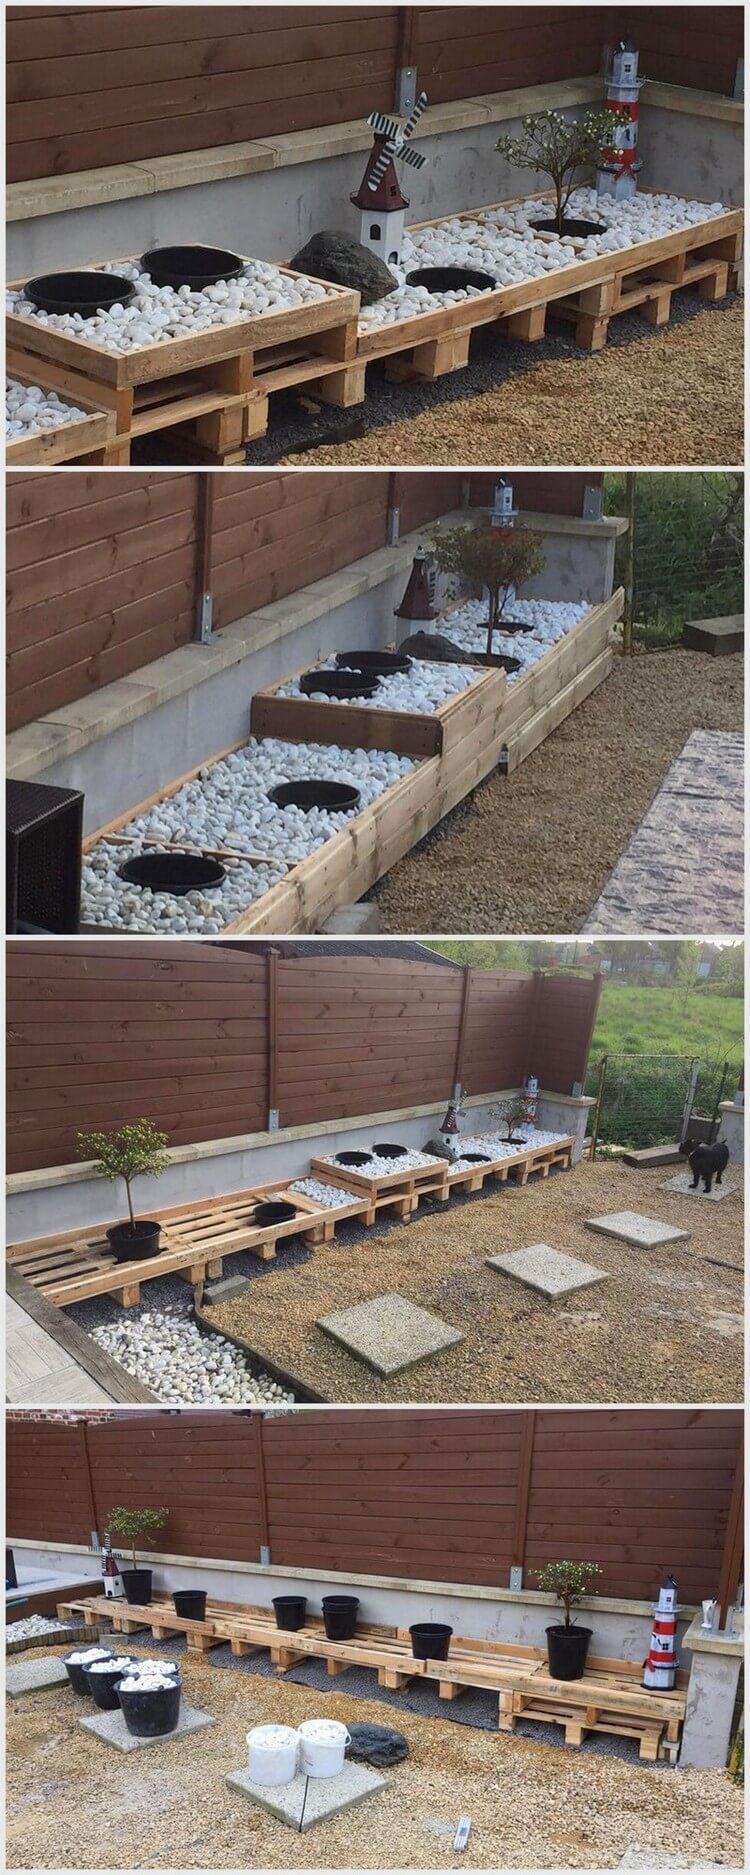 Wood Pallet Garden Project